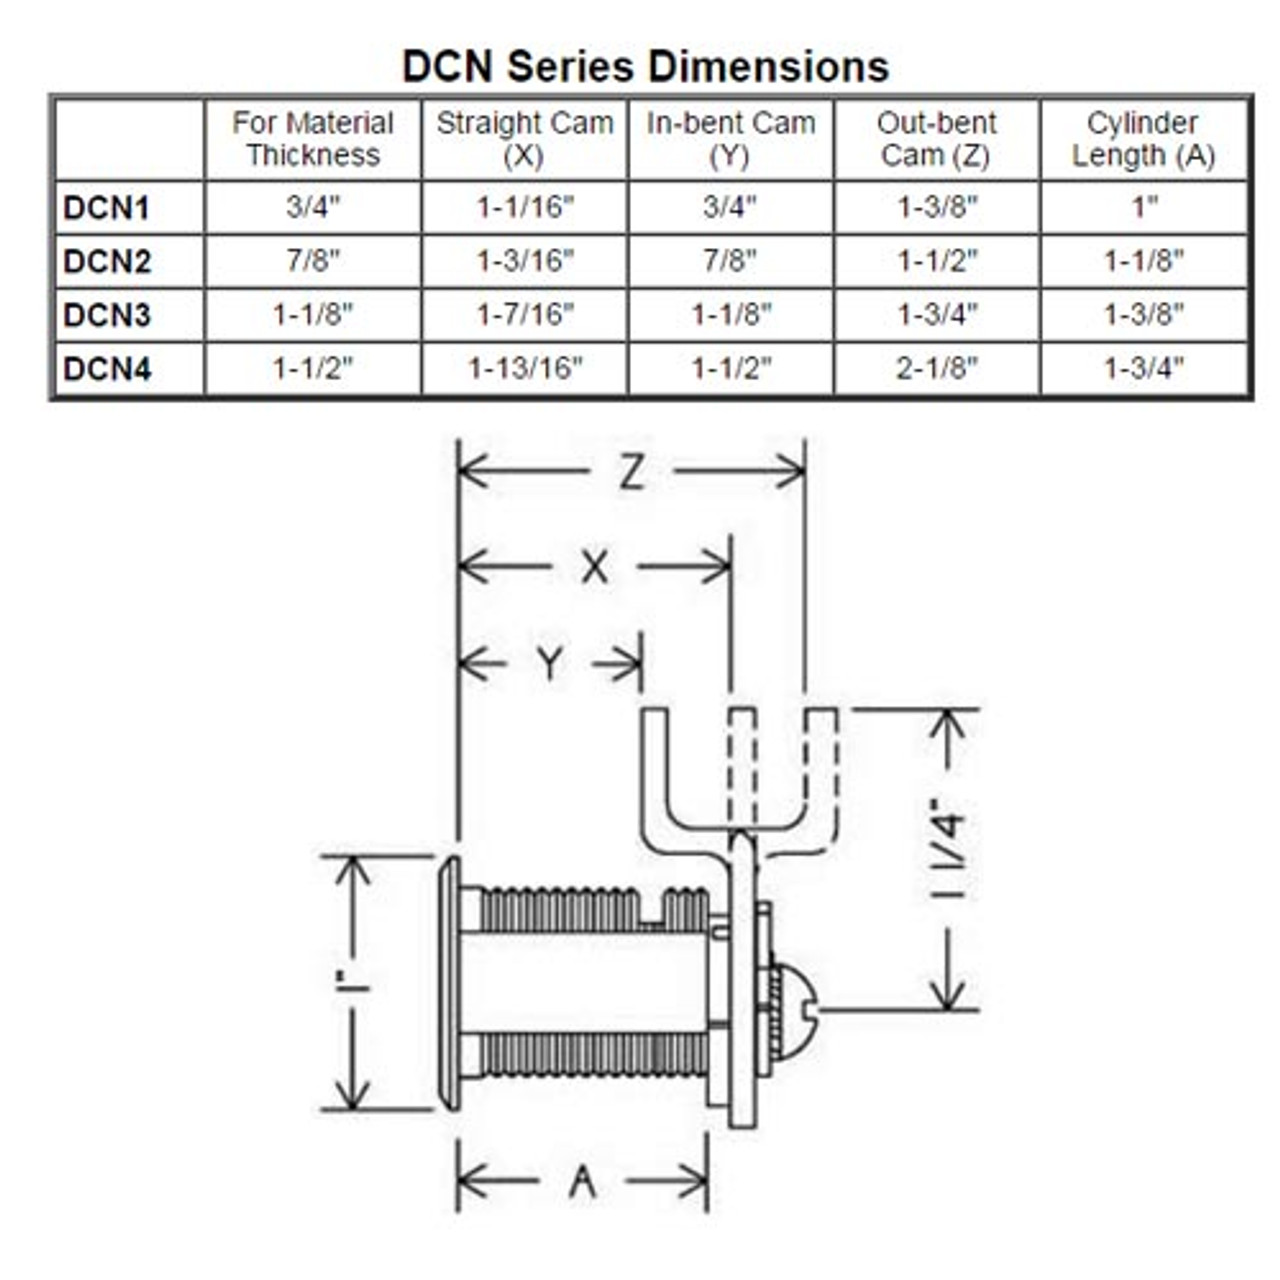 Olympus DCN1-MK-26D N Series Master Keyed Reversible Cam Lock in Satin Chrome